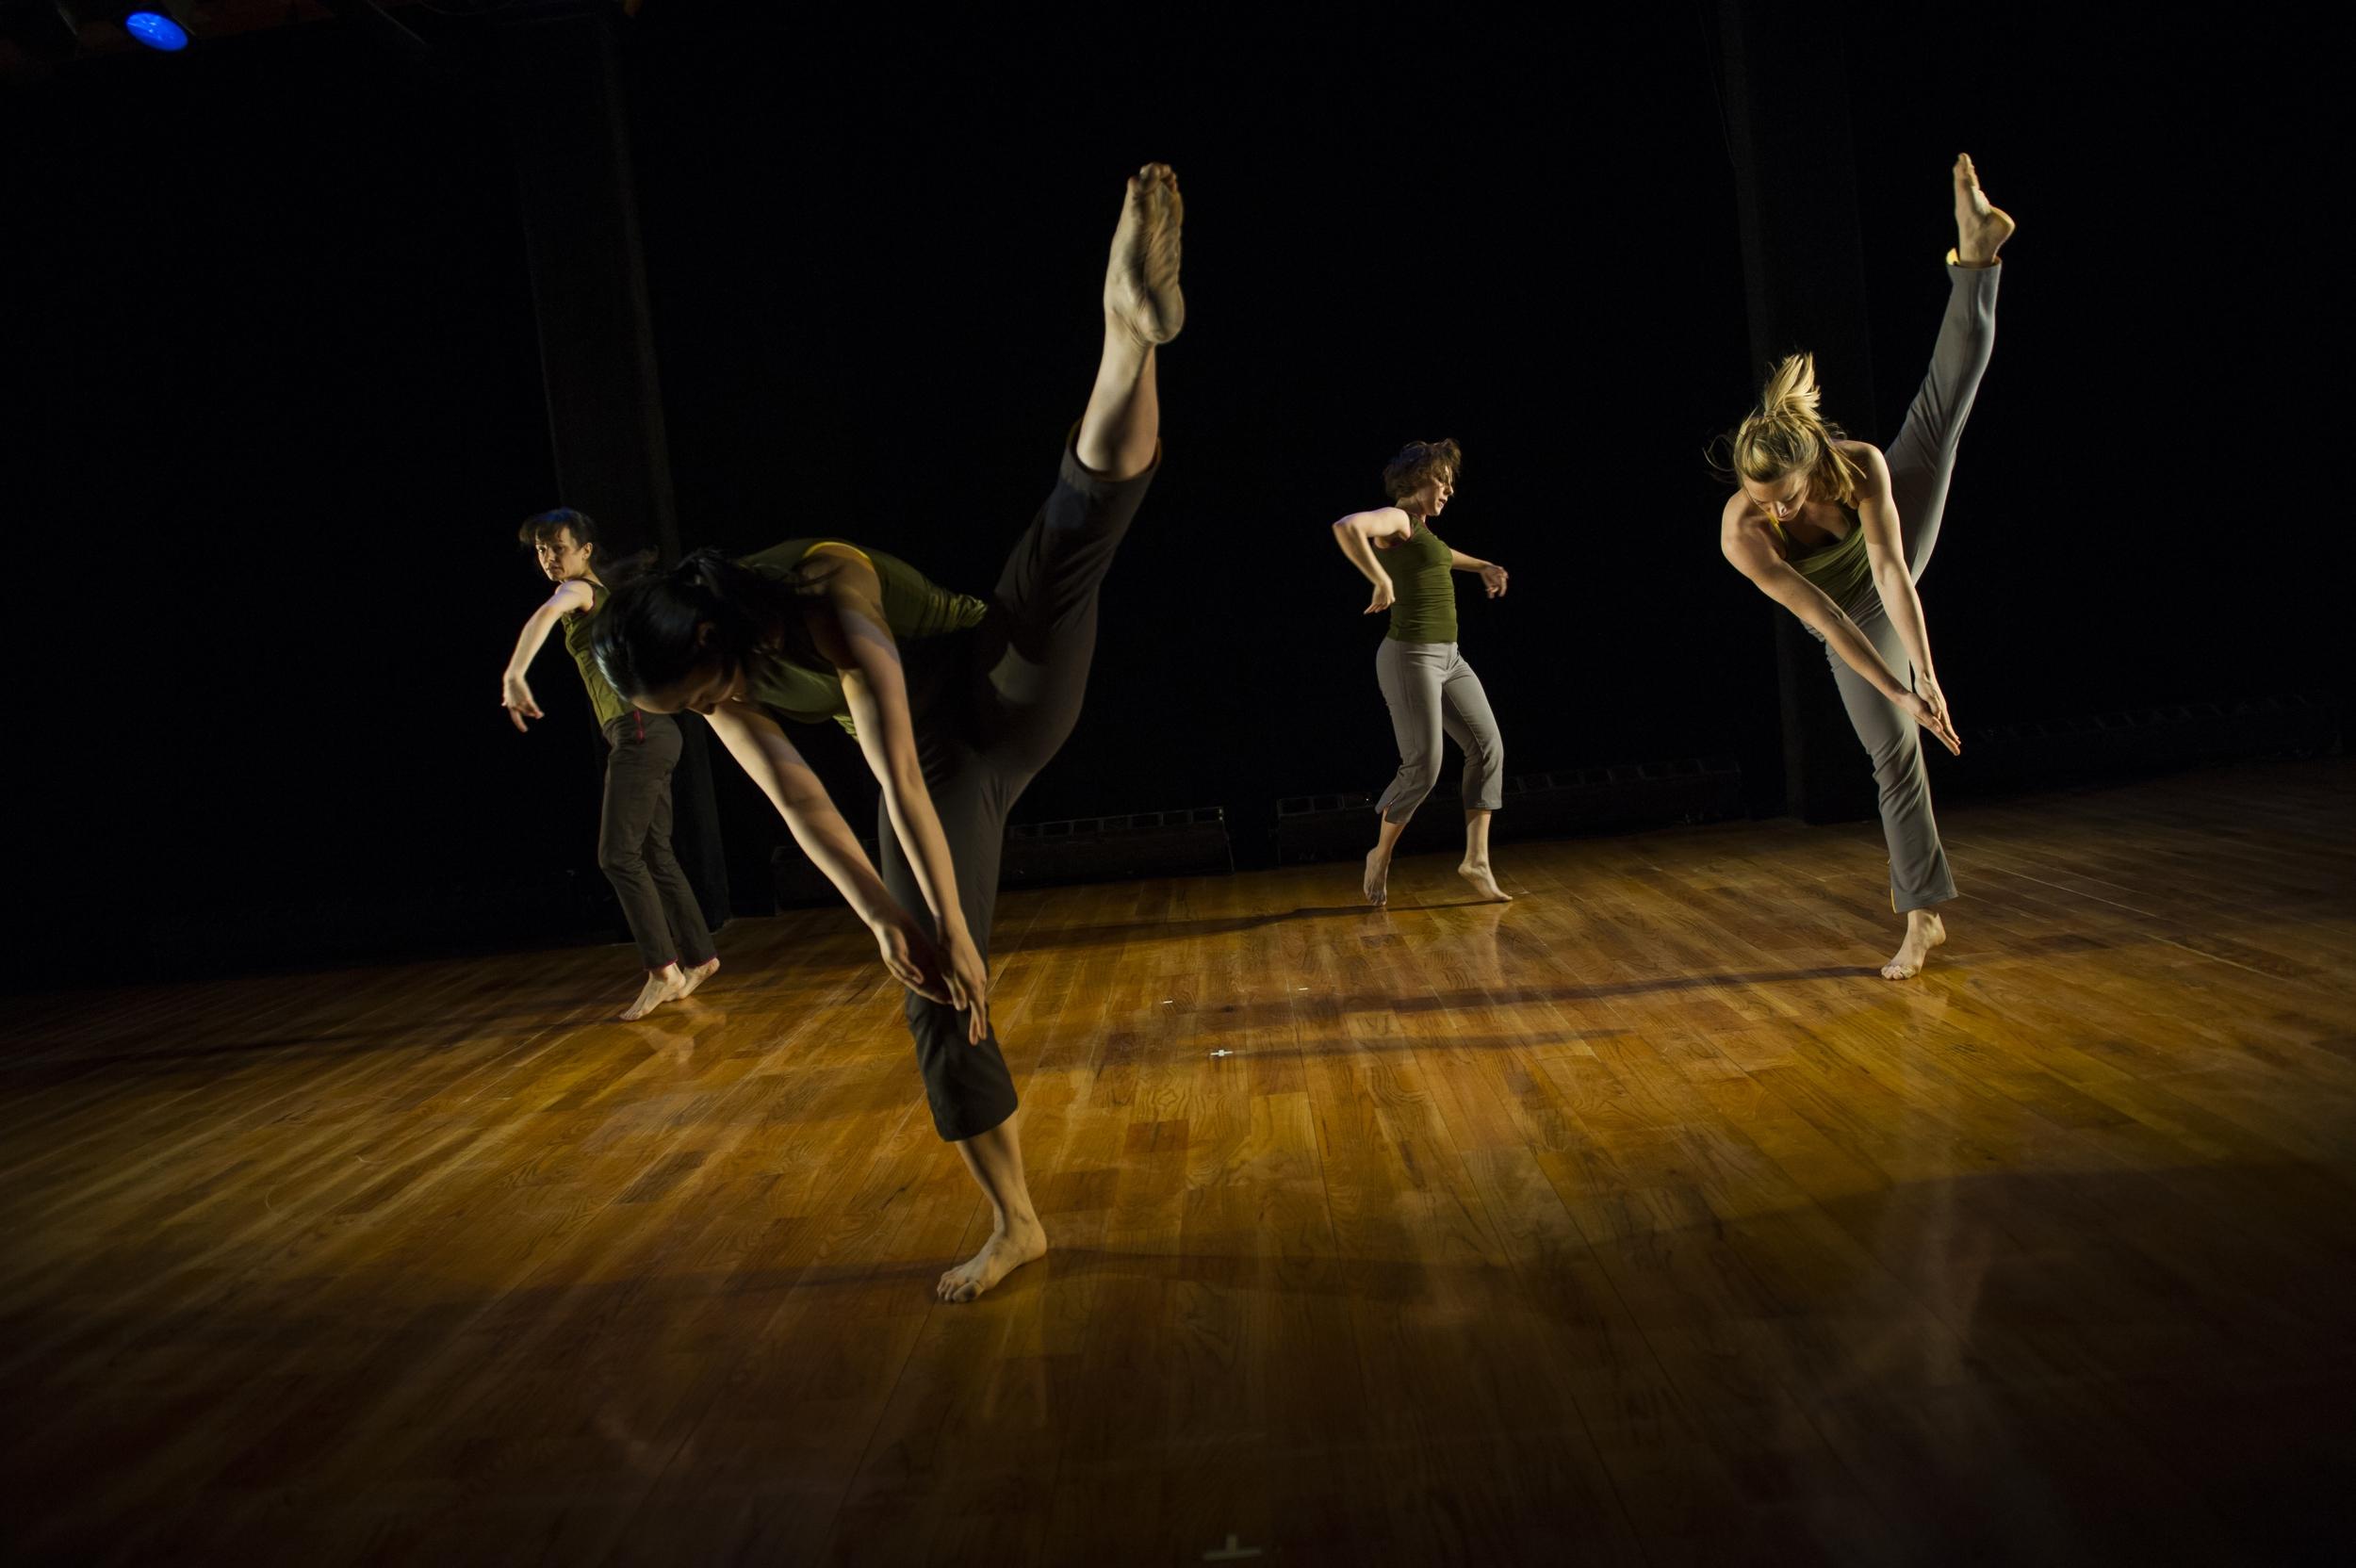 Sue_Bernhard_Danceworks_Paula_Lobo-13.jpg